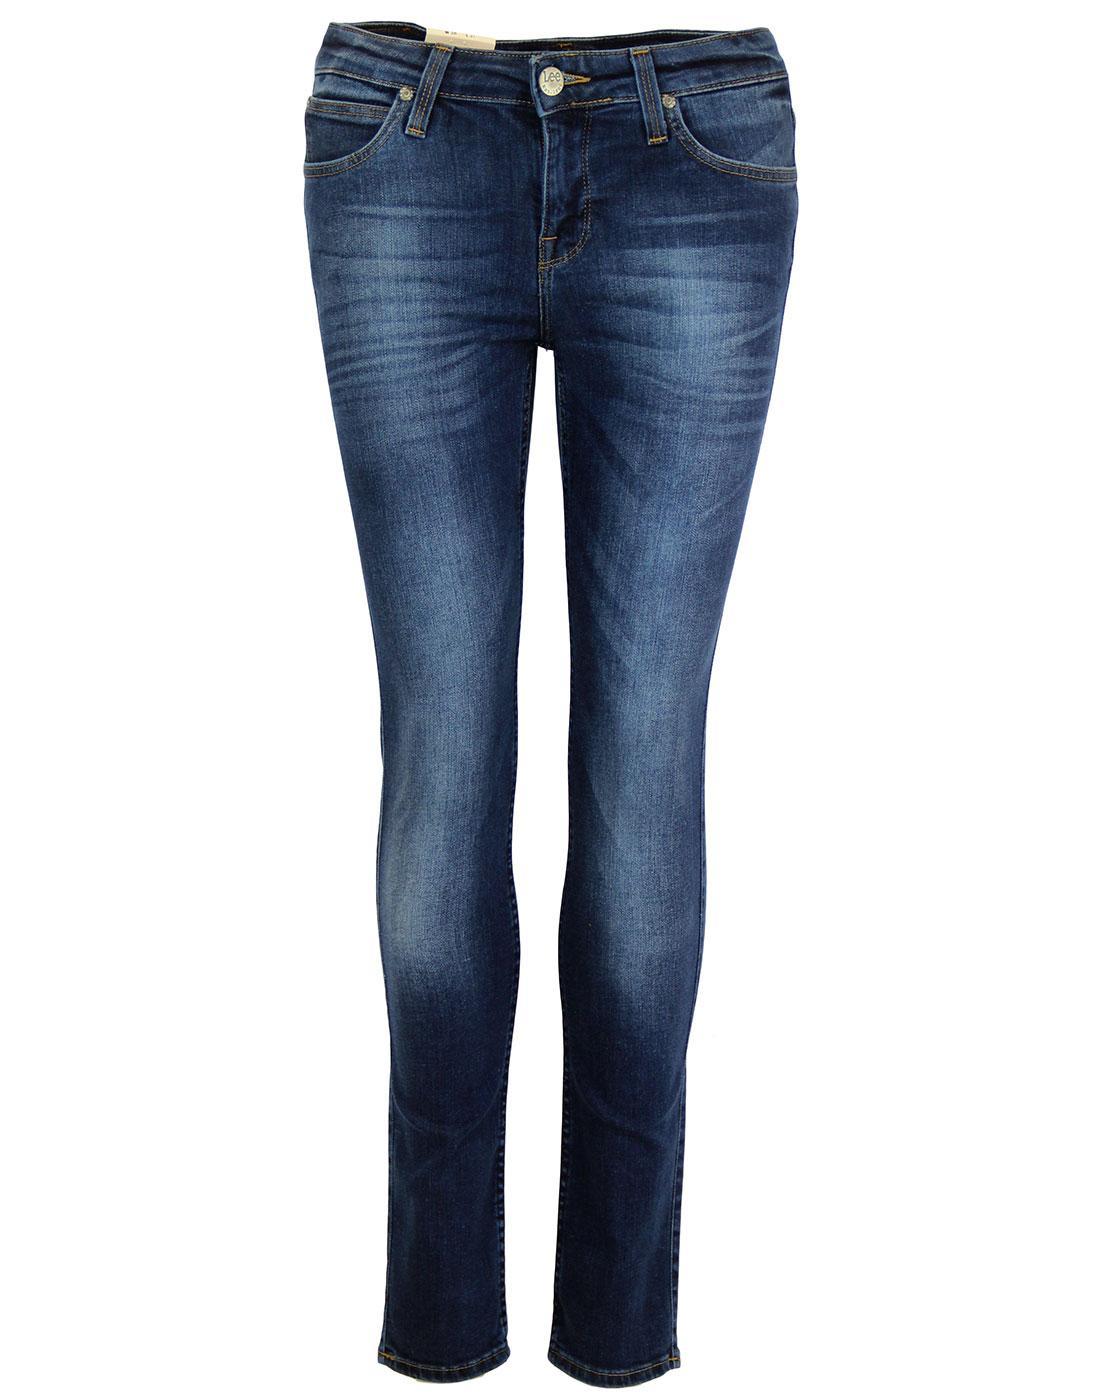 Scarlett LEE Retro Night Sky Skinny Denim Jeans